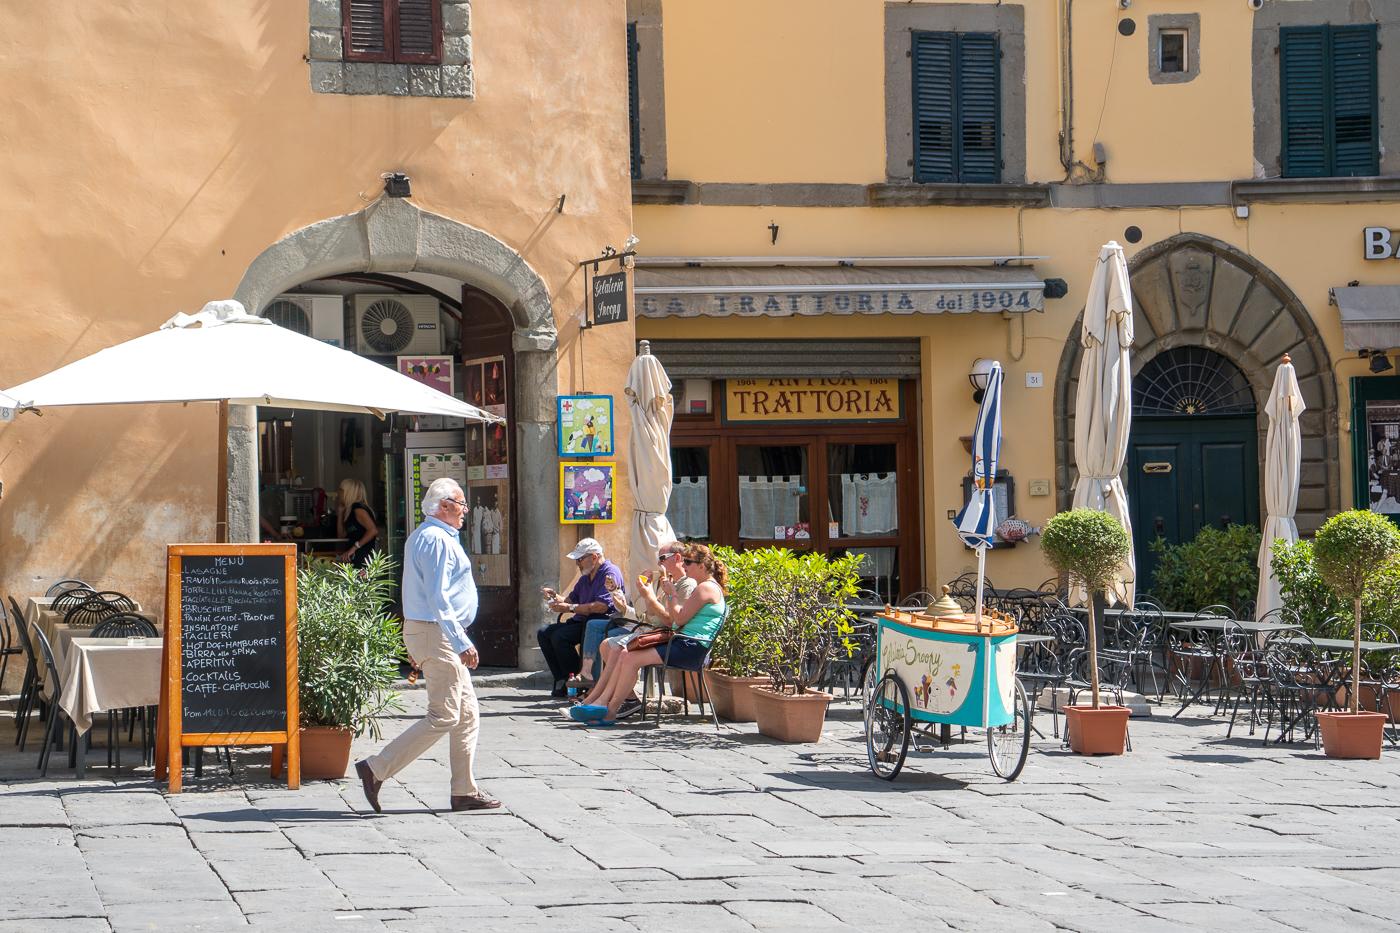 Terrasse de Cortona - Incontournables en Toscane